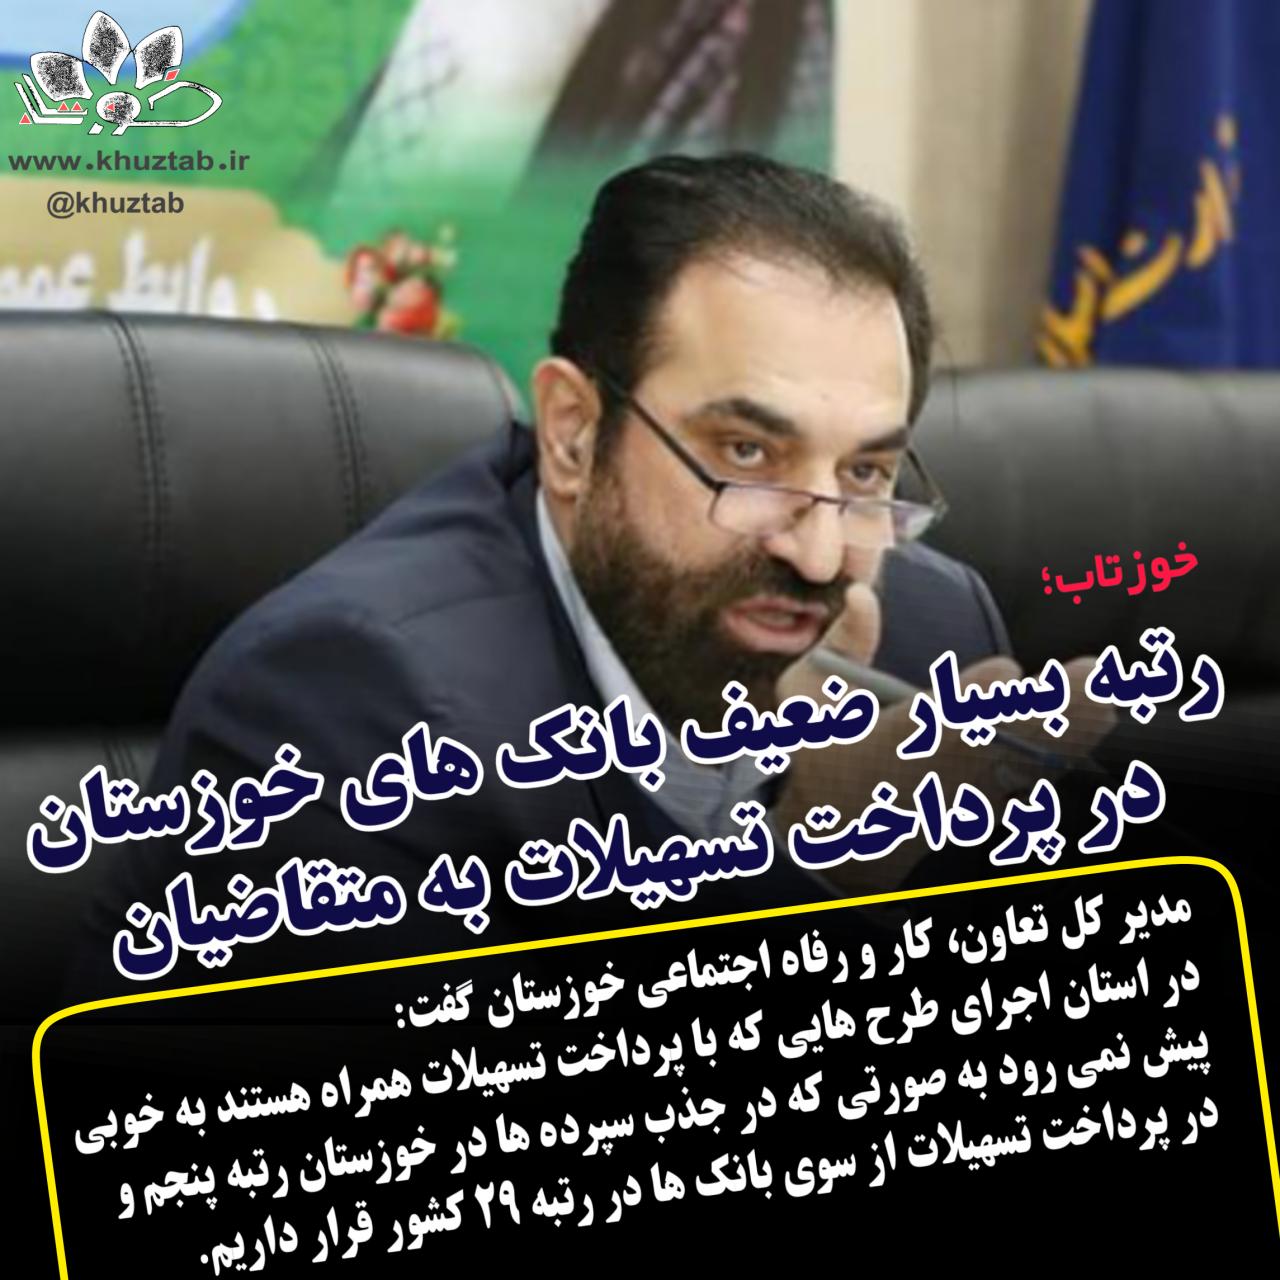 PicsArt 12 18 11.06.33 1280x1280 رتبه بسیارضعیف بانک های خوزستان در پرداخت تسهیلات